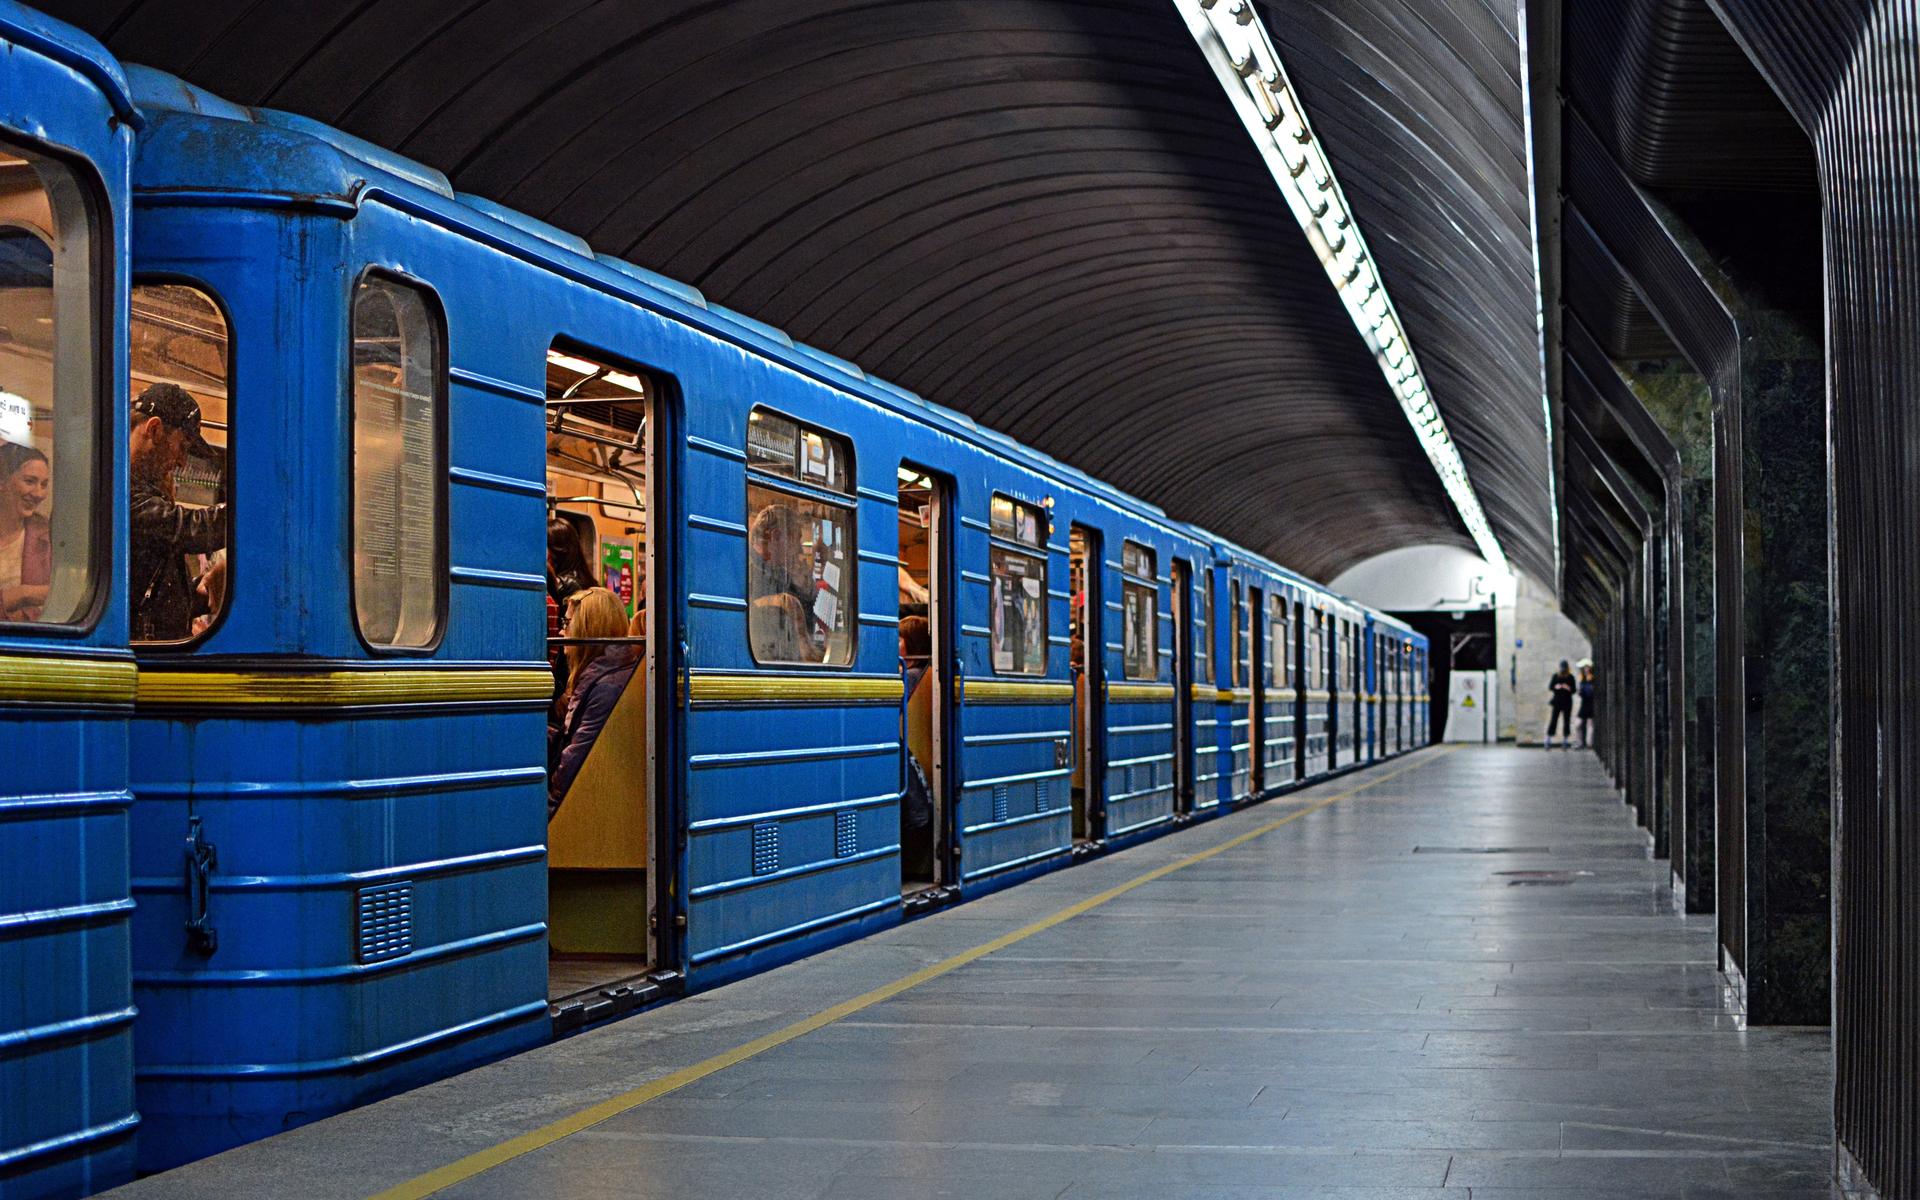 kiev ukraine bitcoin